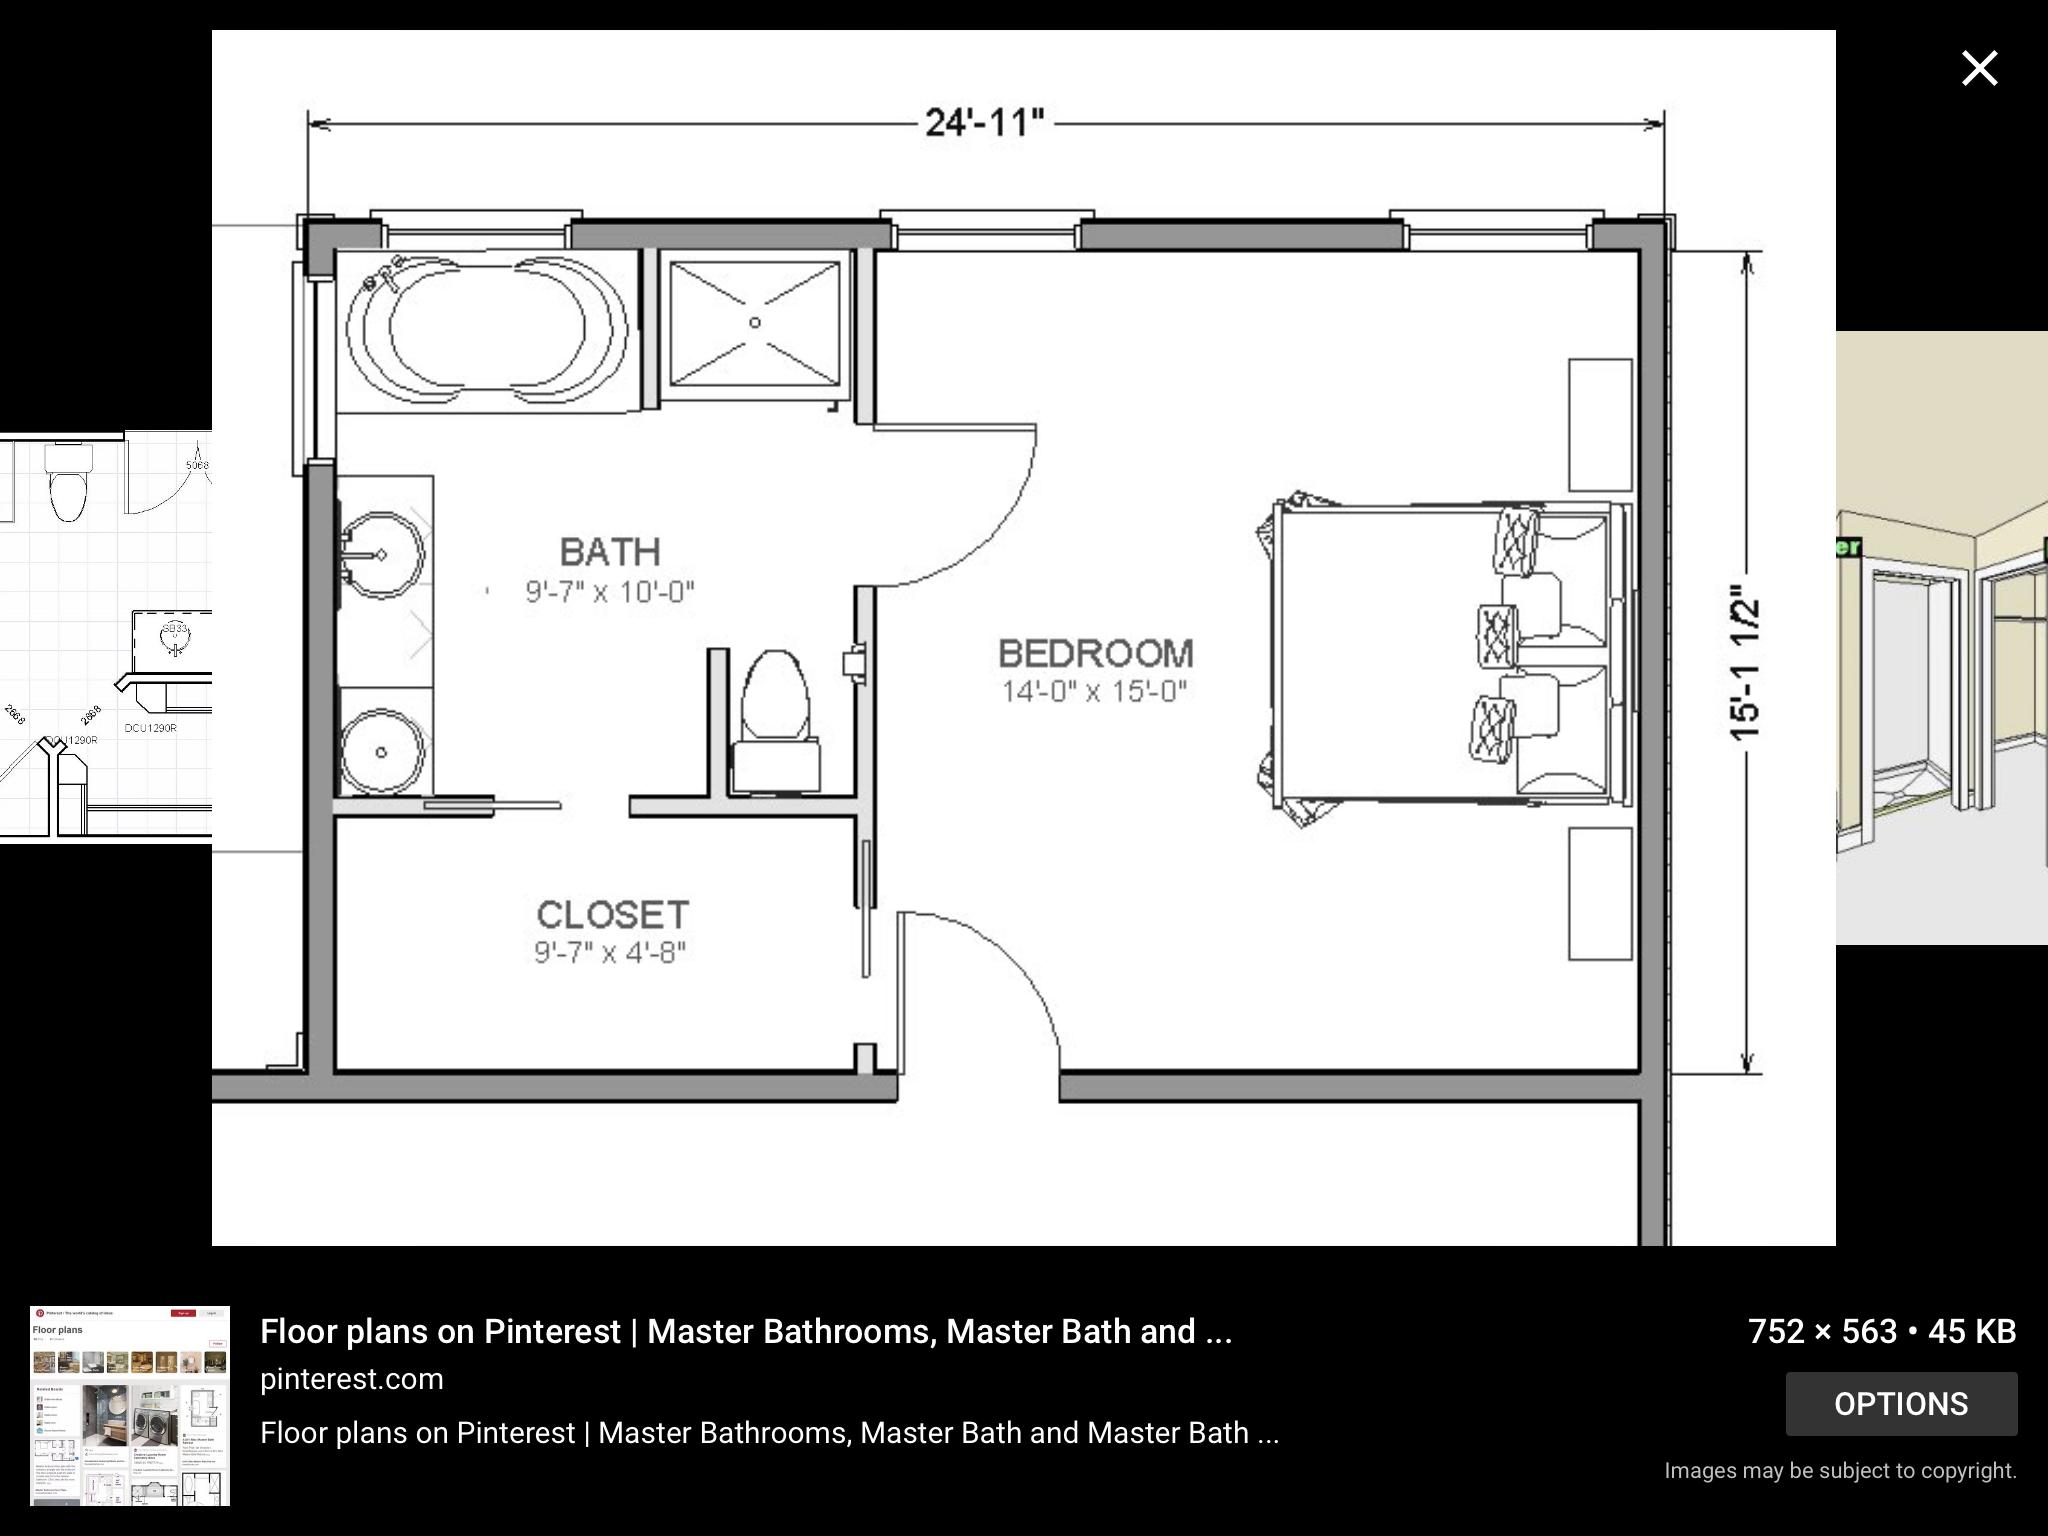 Pin By Carolina Tavares On House Flip Master Bedroom Plans Master Bedroom Layout Master Bathroom Layout